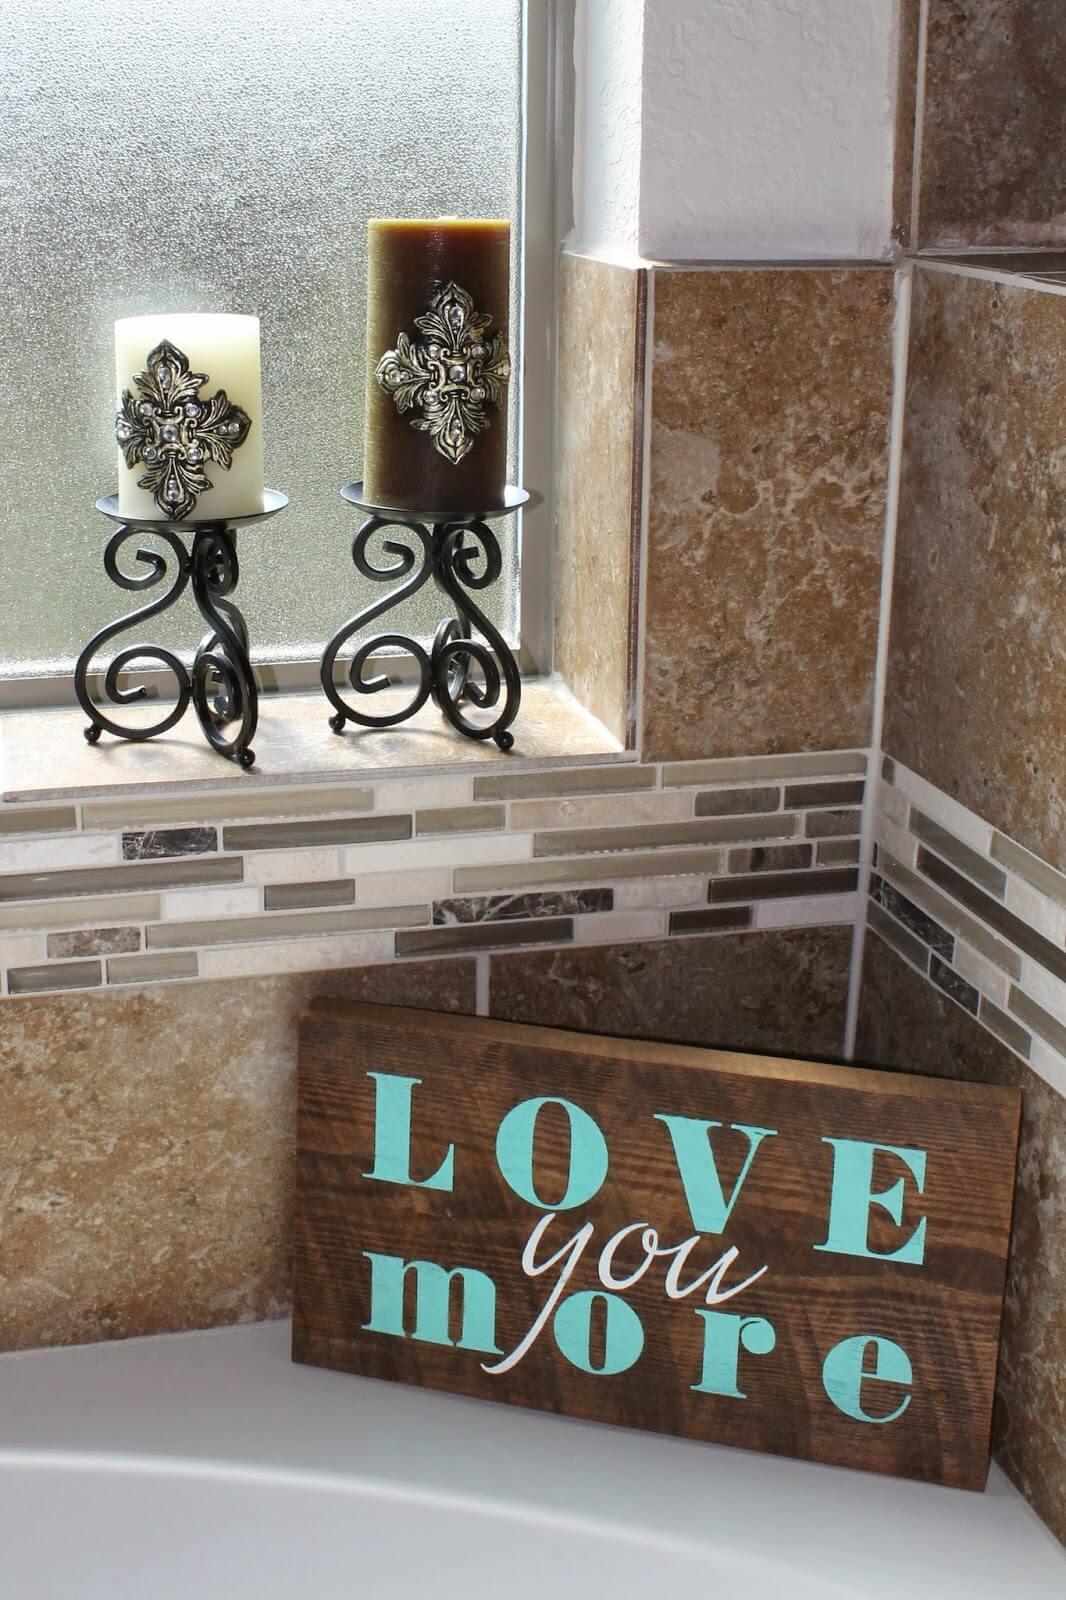 Happy Relationship Reminder for Your Bathroom Nook